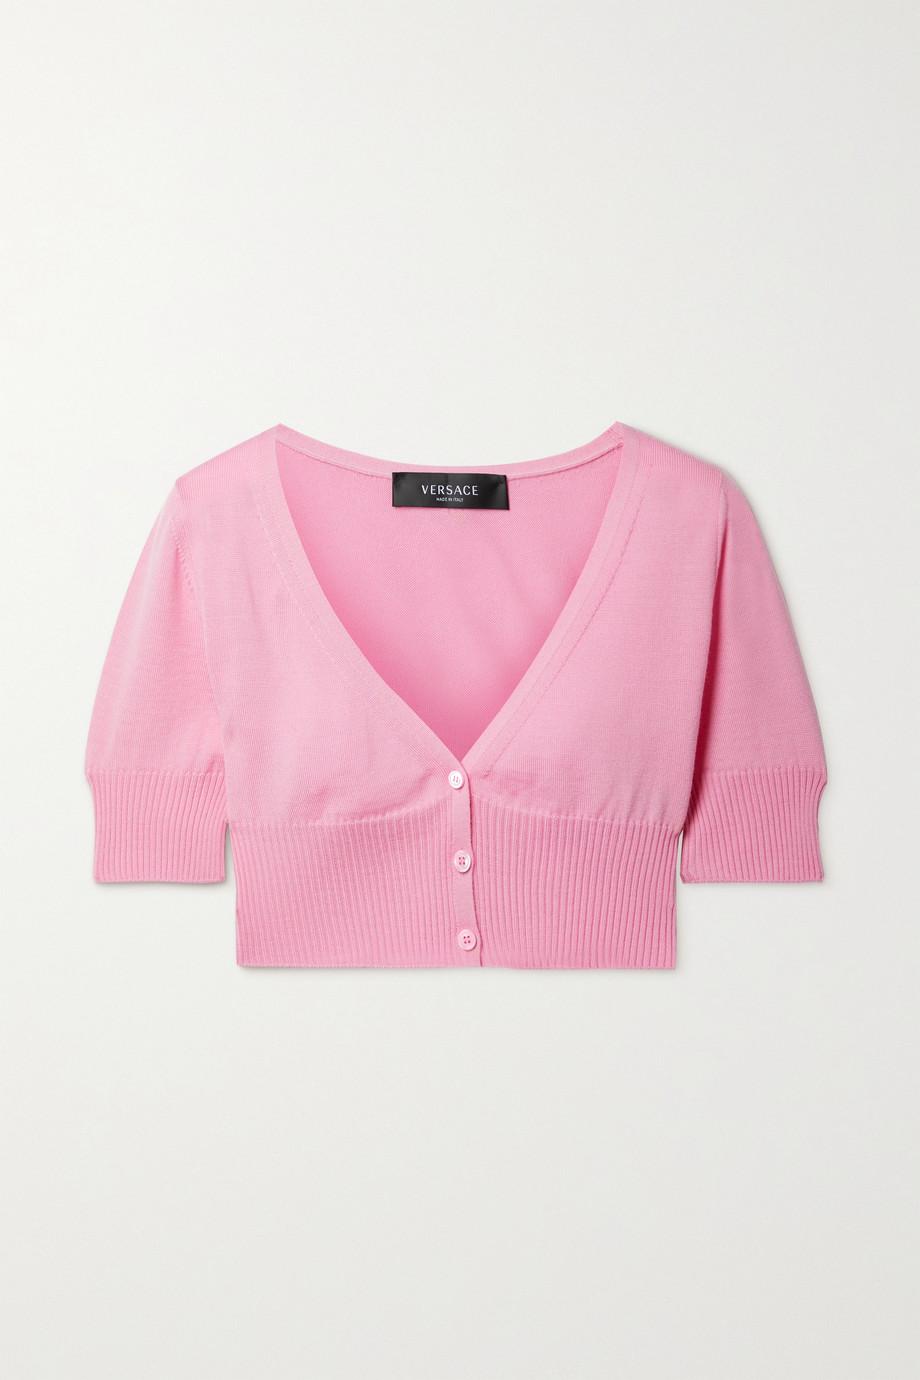 Versace Cropped wool cardigan